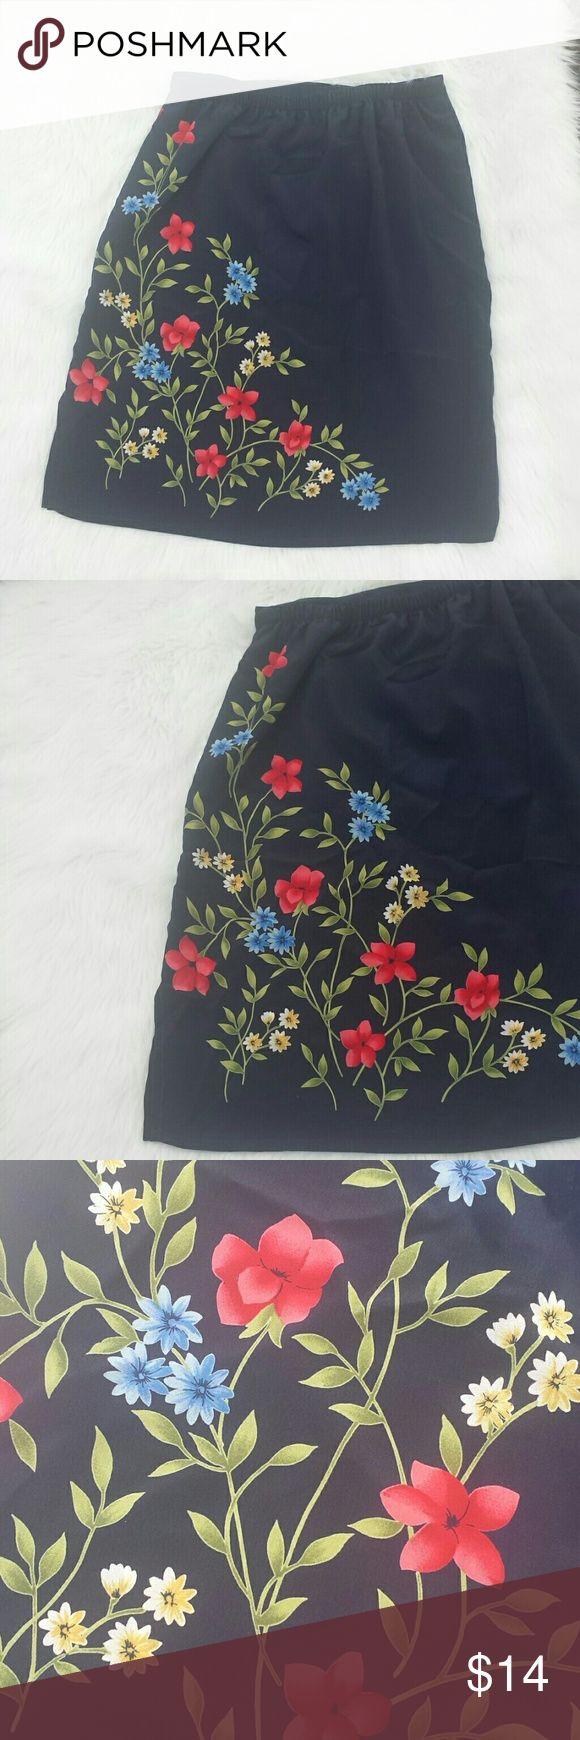 "90's style slip skirt Cute floral slip style skirt - no labels - feels like a nylon/rayon material. Waist 13.5"" length 21"" Skirts Mini"